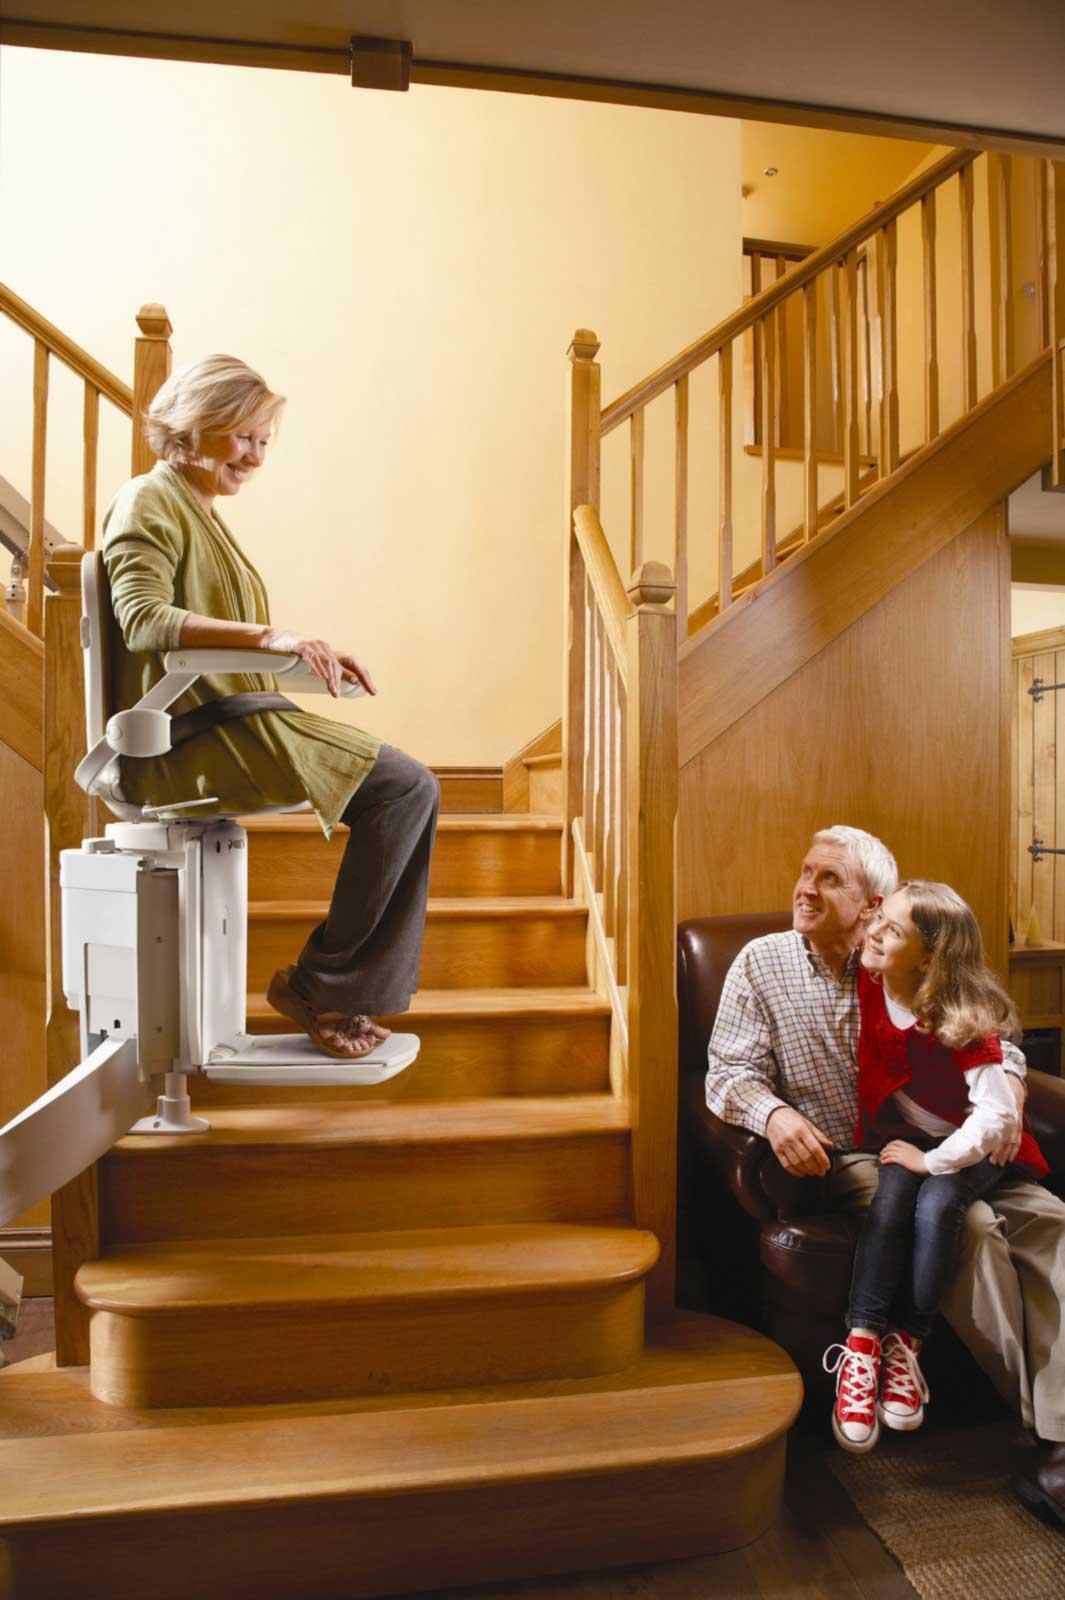 monte escalier temporaire